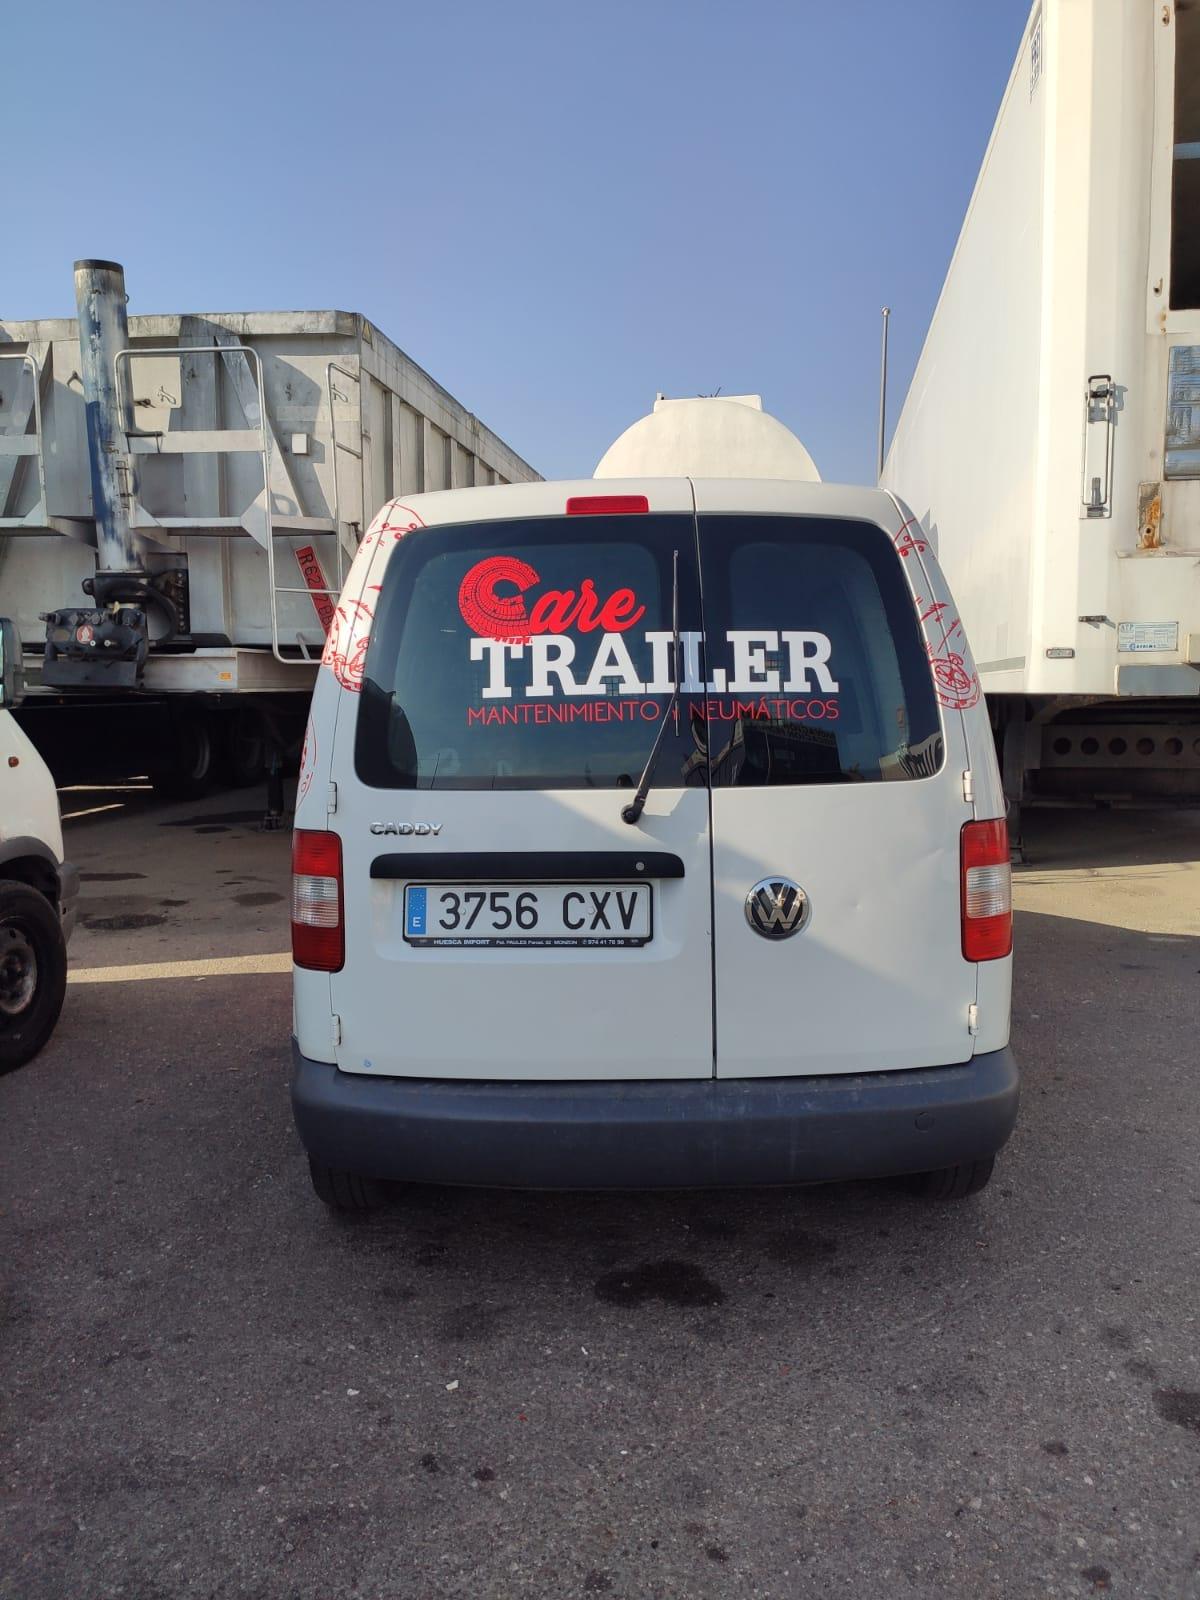 Caretrailer rotulacion furgoneta 3